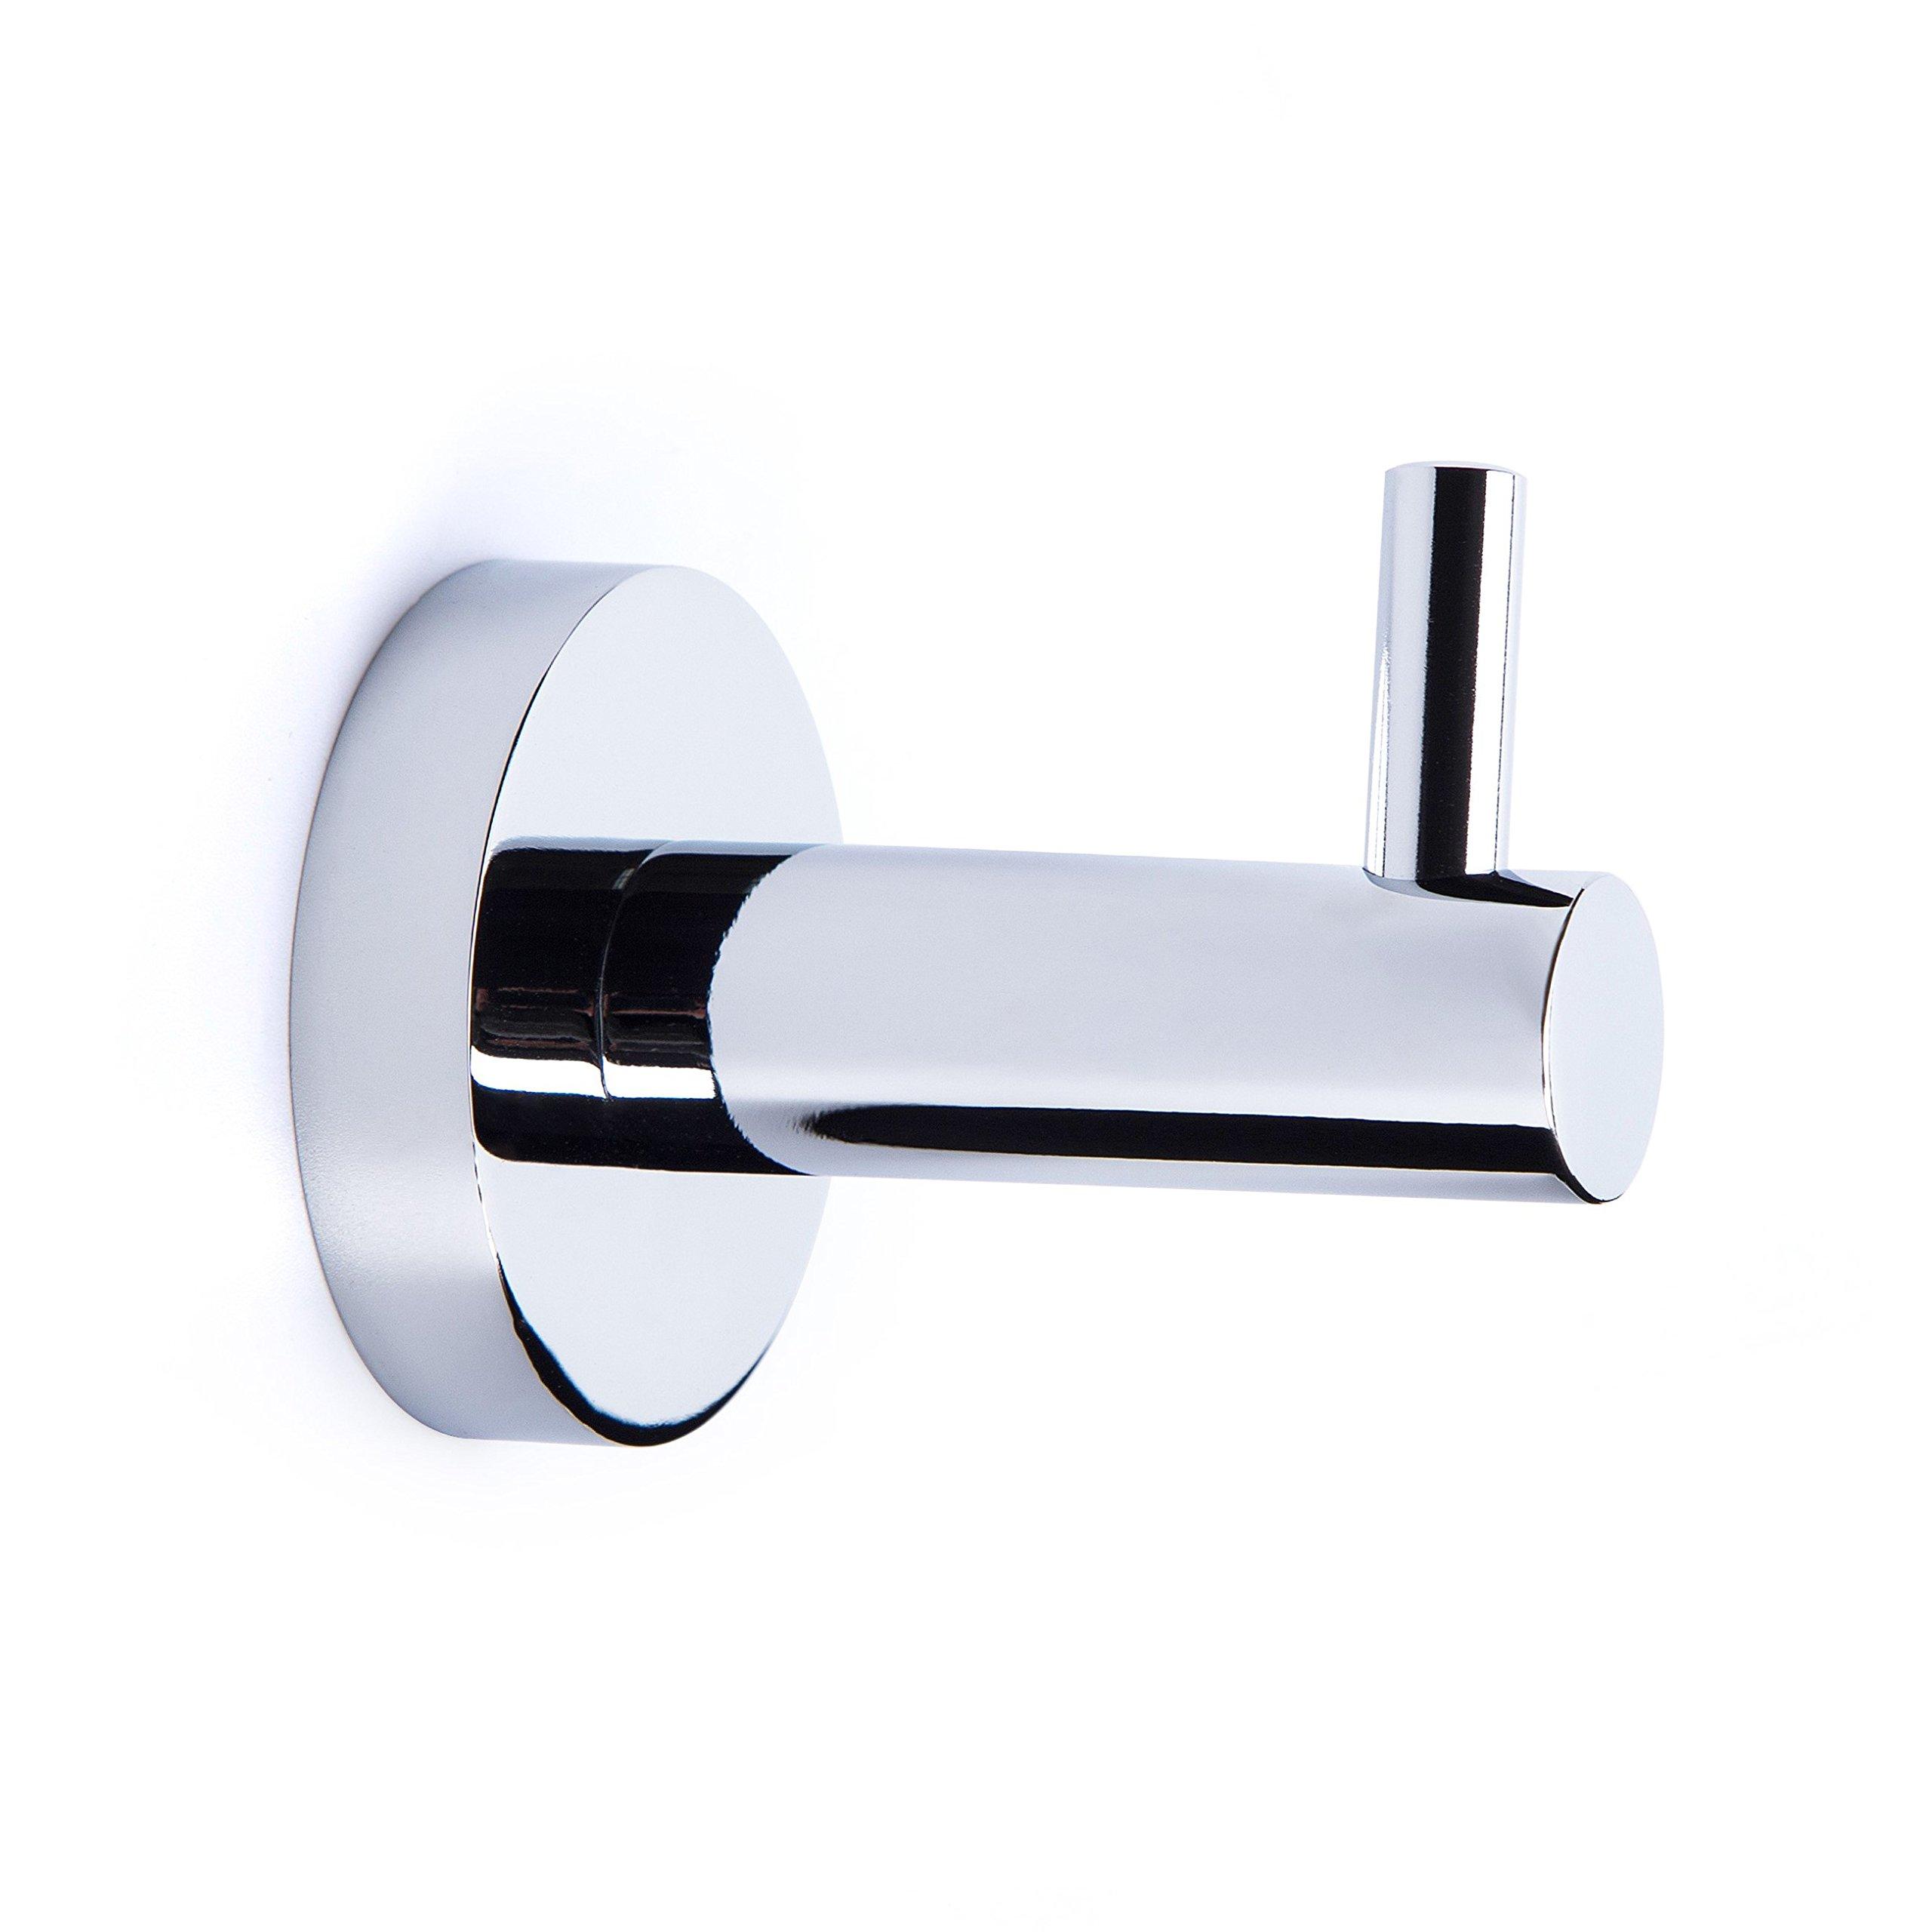 LUCKUP 6 Piece Bath Hardware Towel Bar Accessory Set, Includes 2 ...